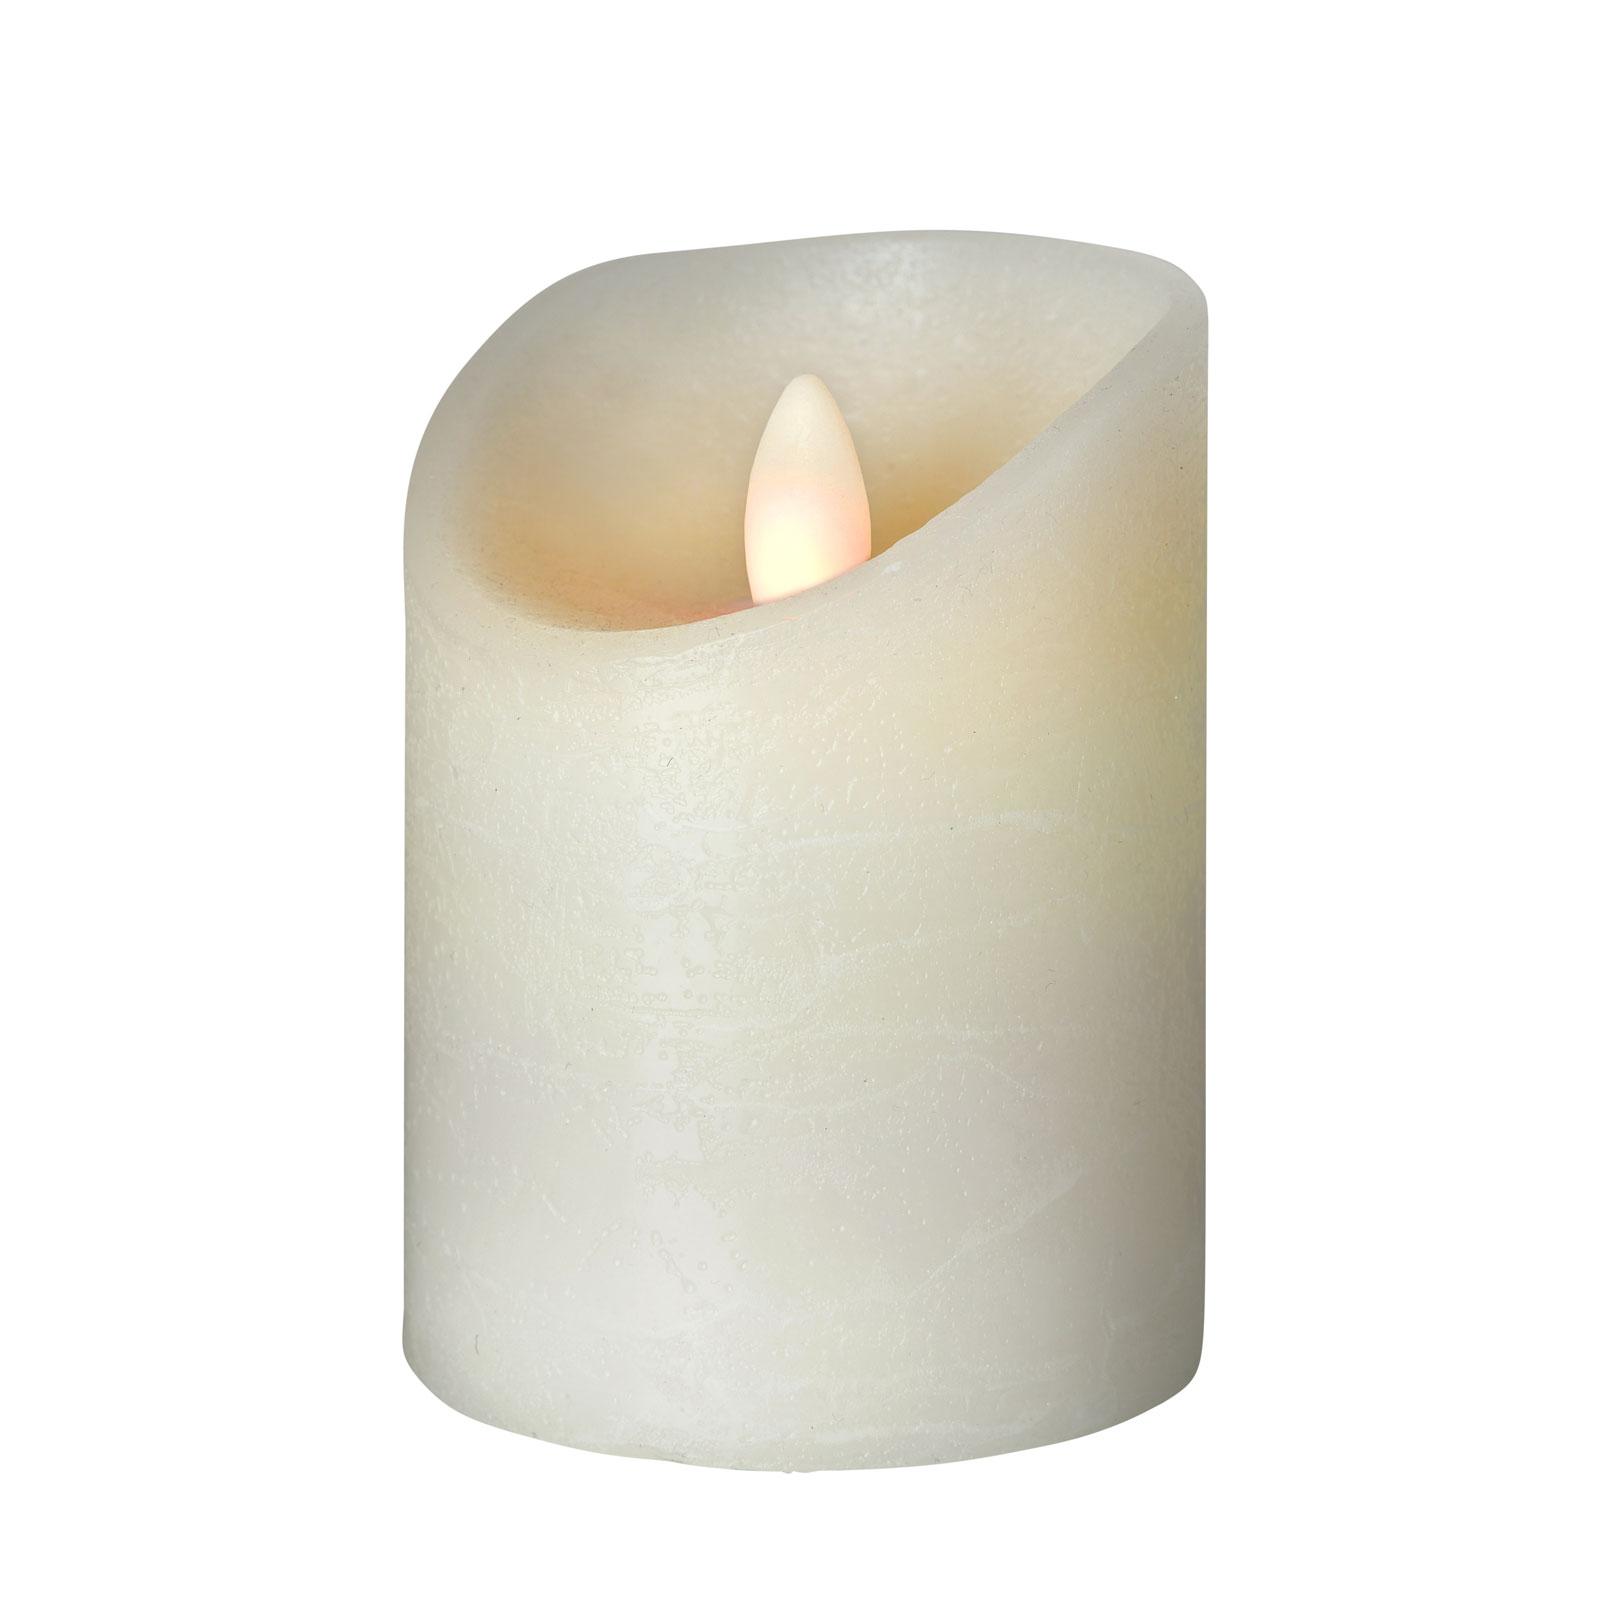 LED-lys Shine, Ø 7,5 cm, elfenben, høyde 12,5cm